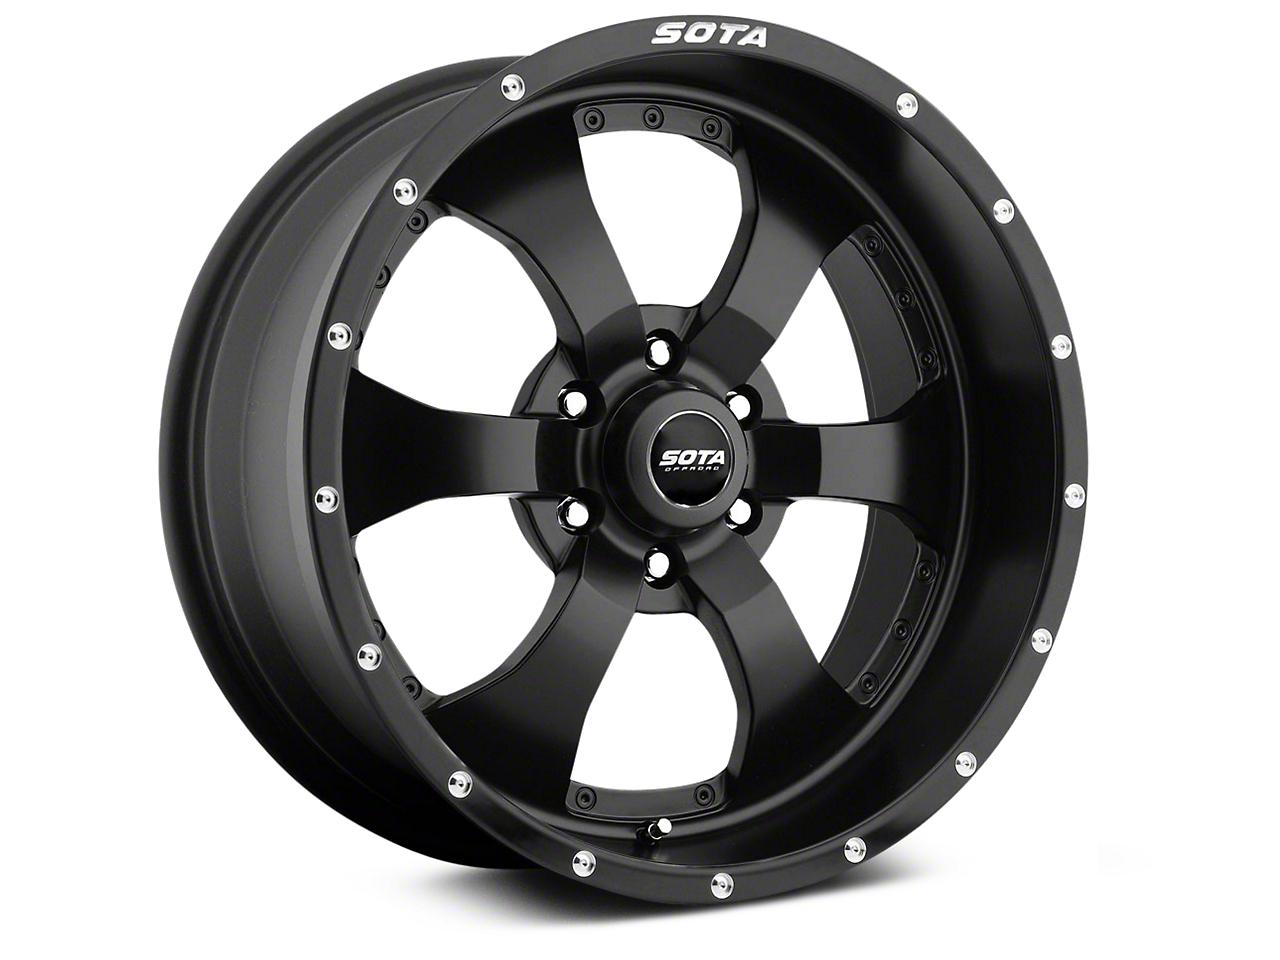 SOTA Off Road NOVAKANE Stealth Black 6-Lug Wheel - 18x9 (07-18 Sierra 1500)